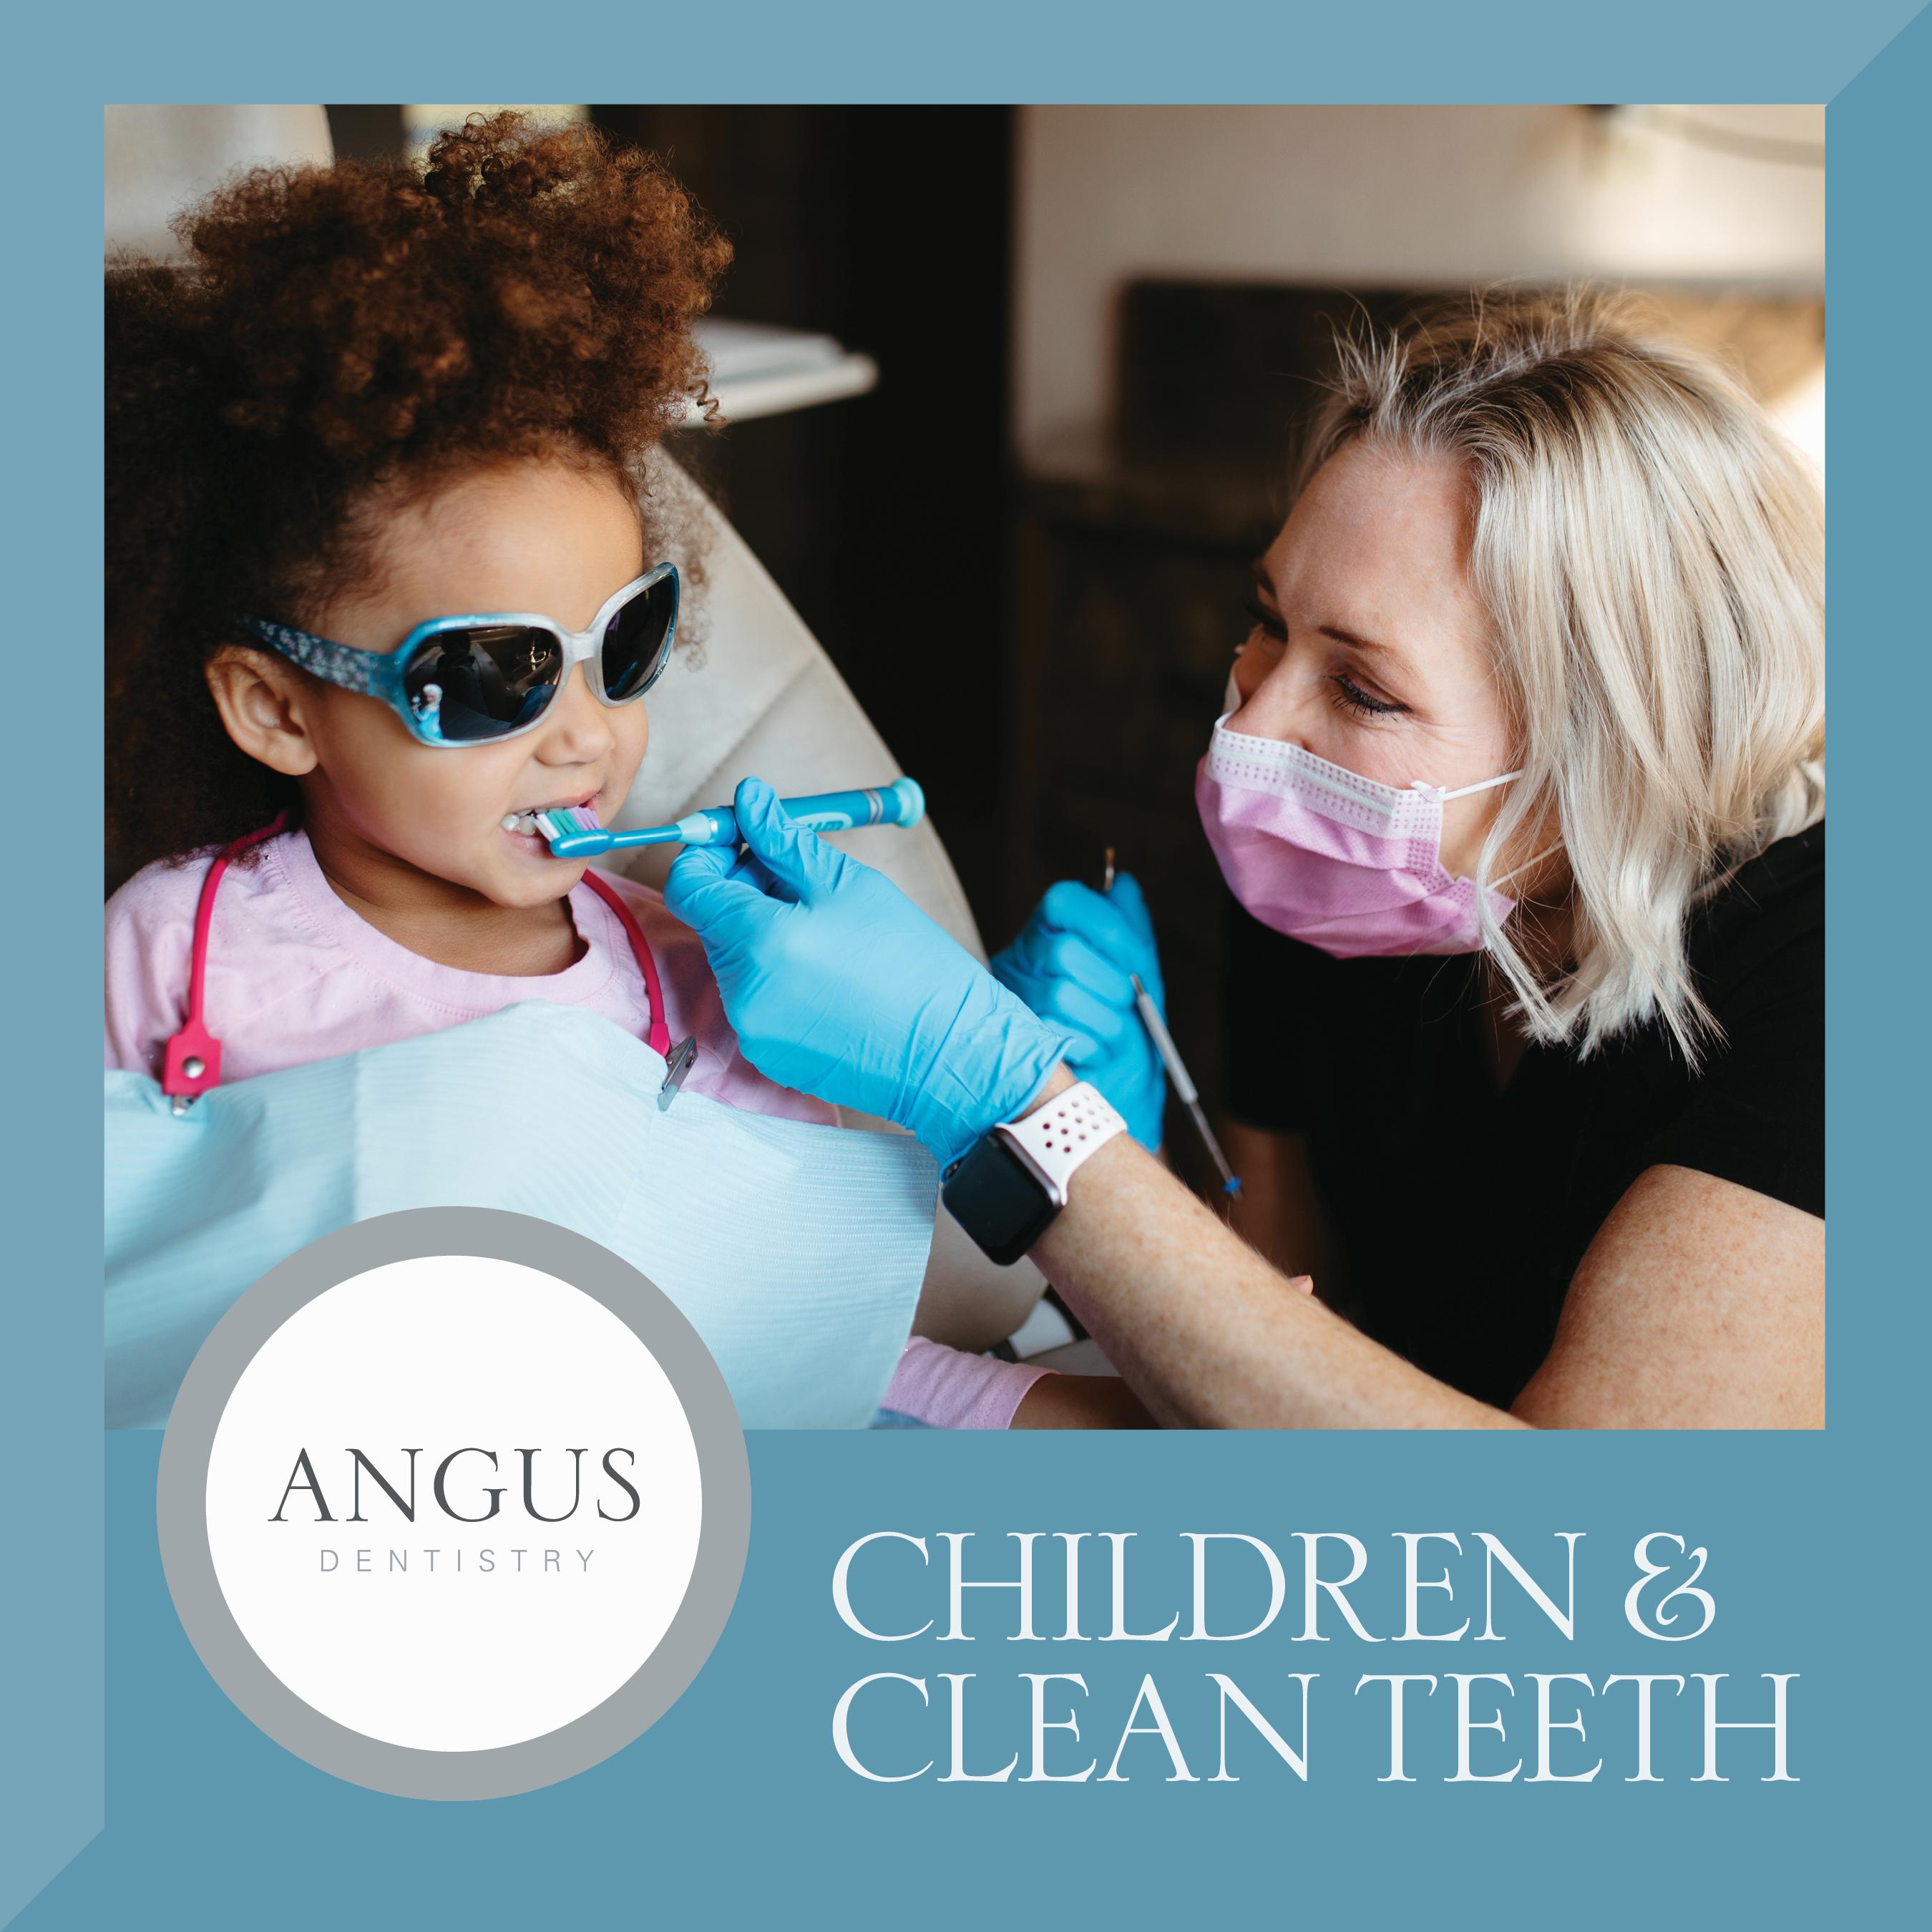 Angus-21-02-Jan-Posts6